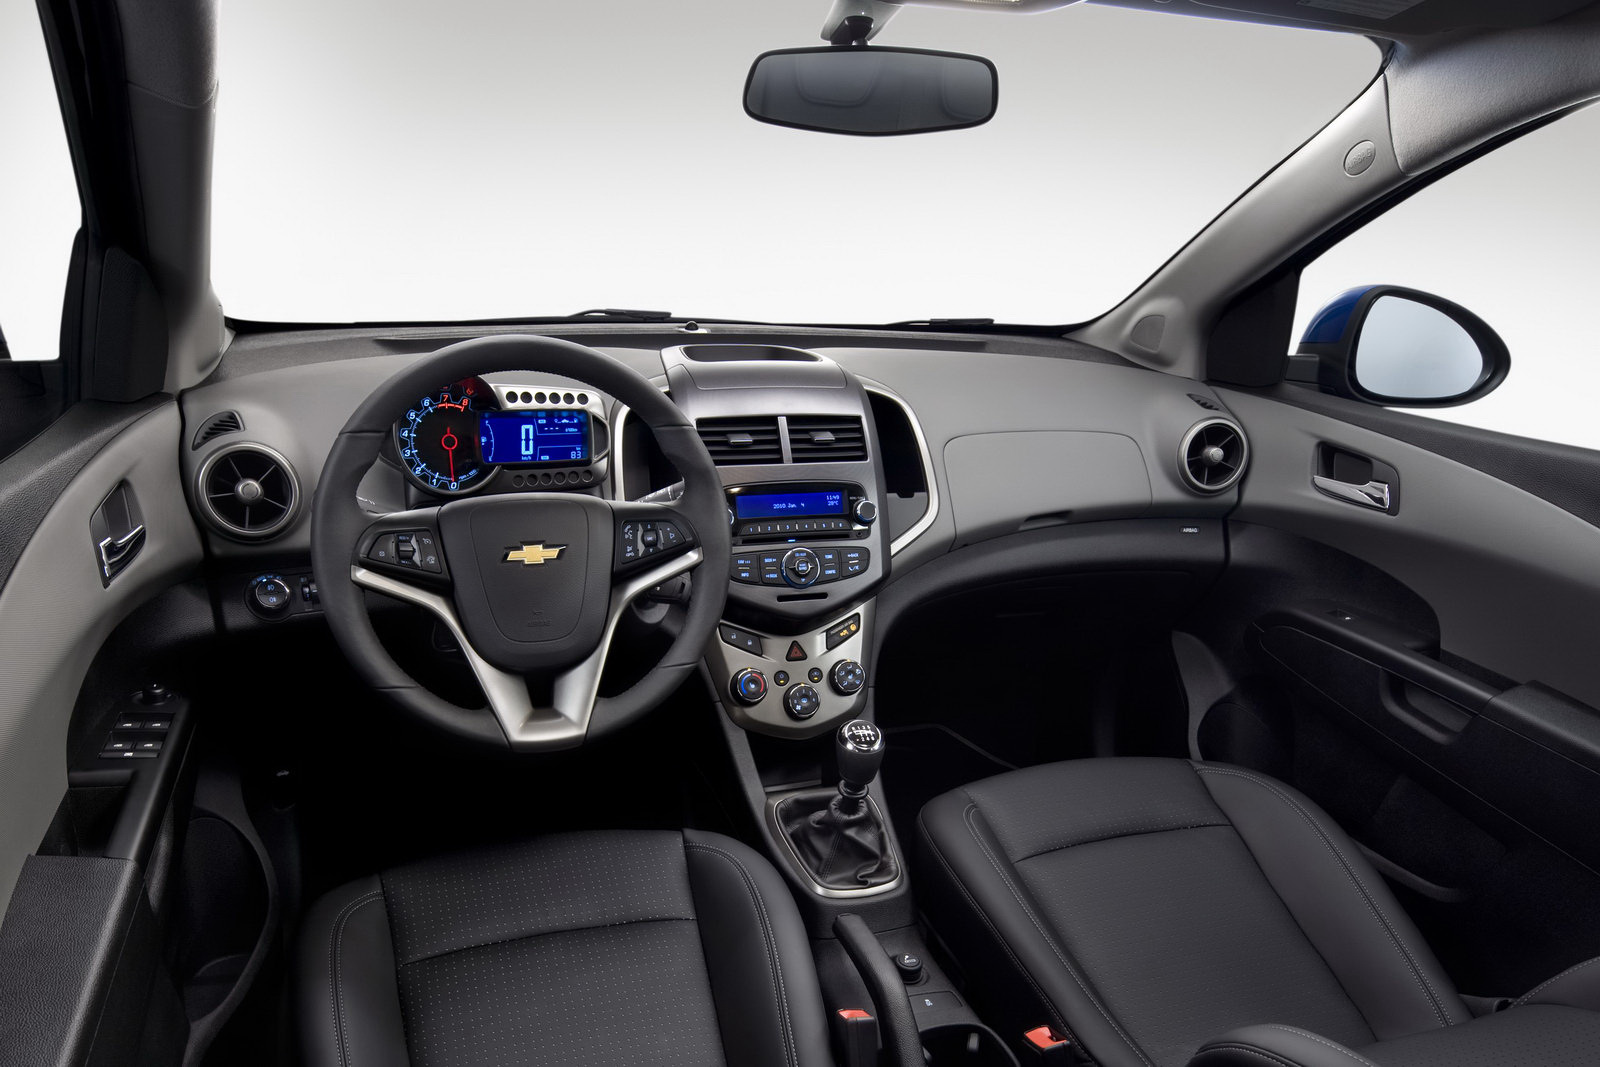 Chevrolet Aveo  2011-chevrolet-aveo-4